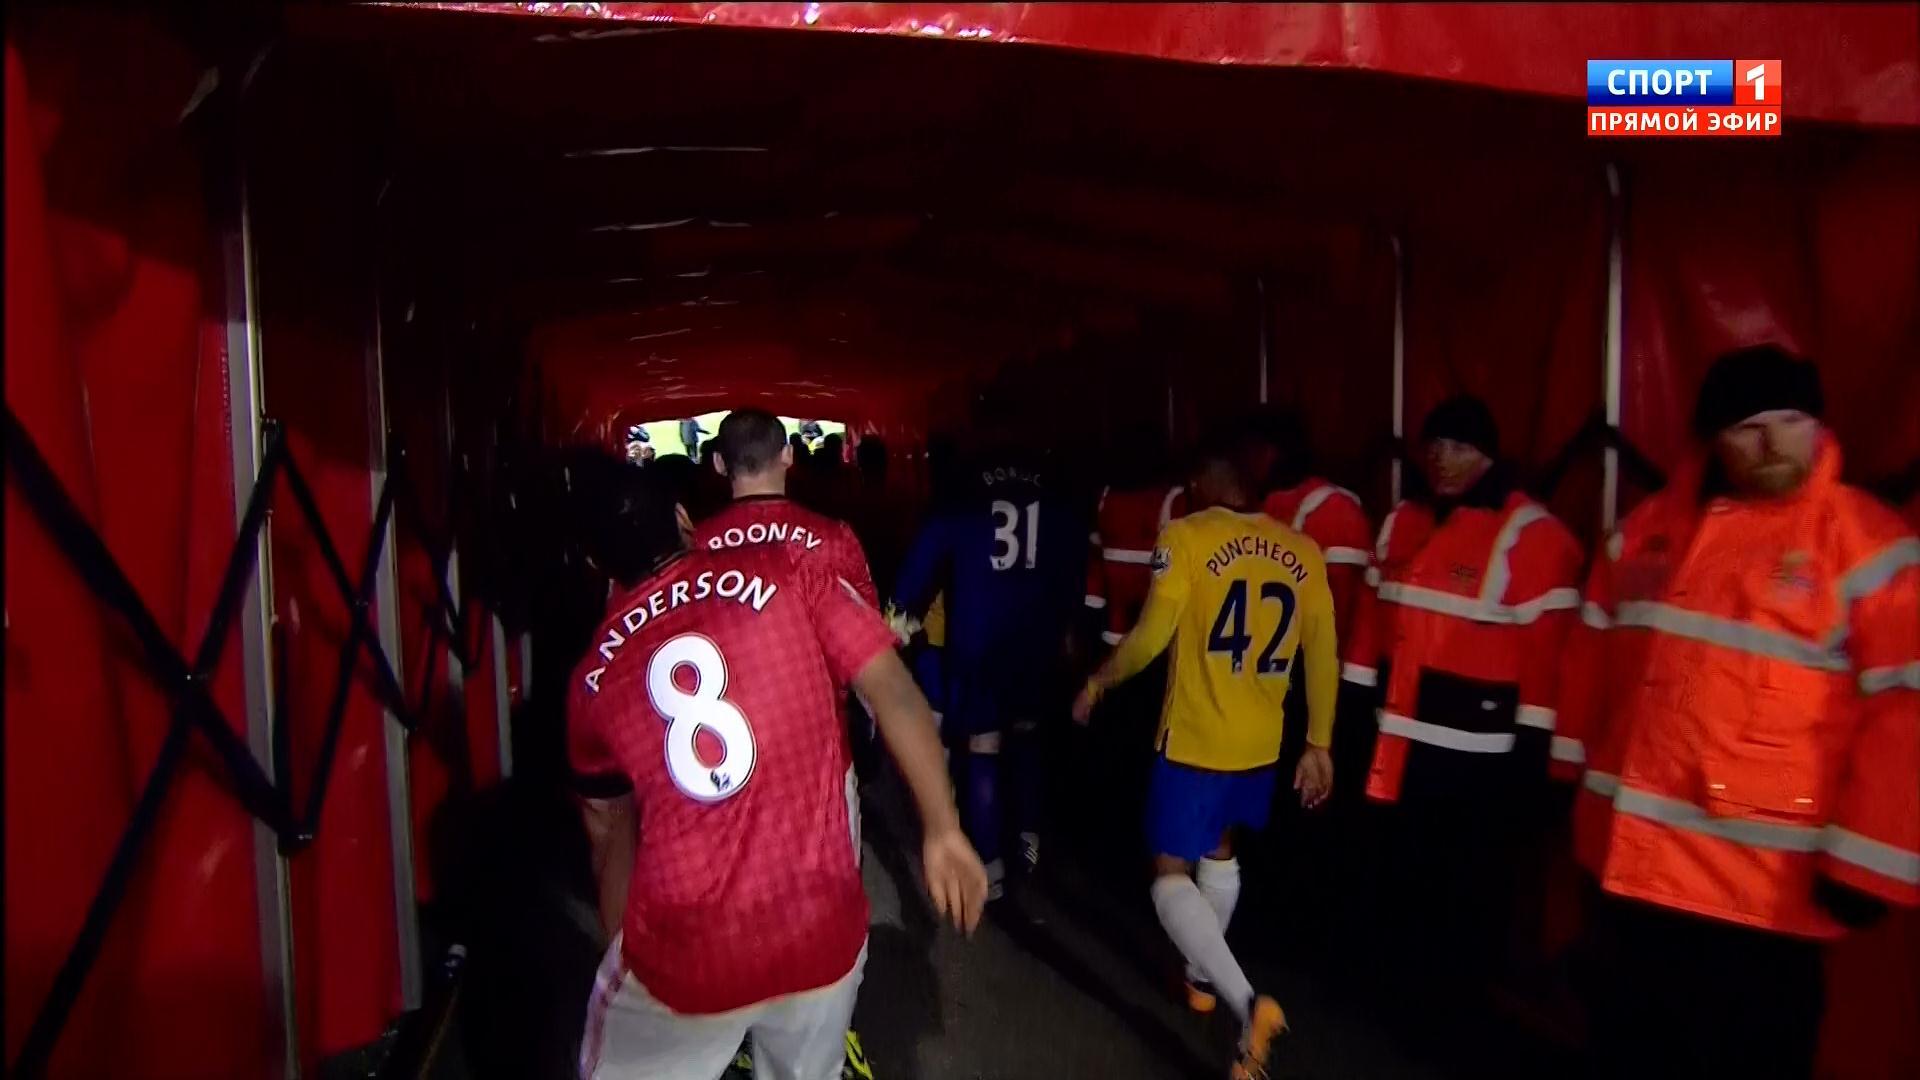 EPL Week 24 - Manchester United - Southhampton |Full Match|